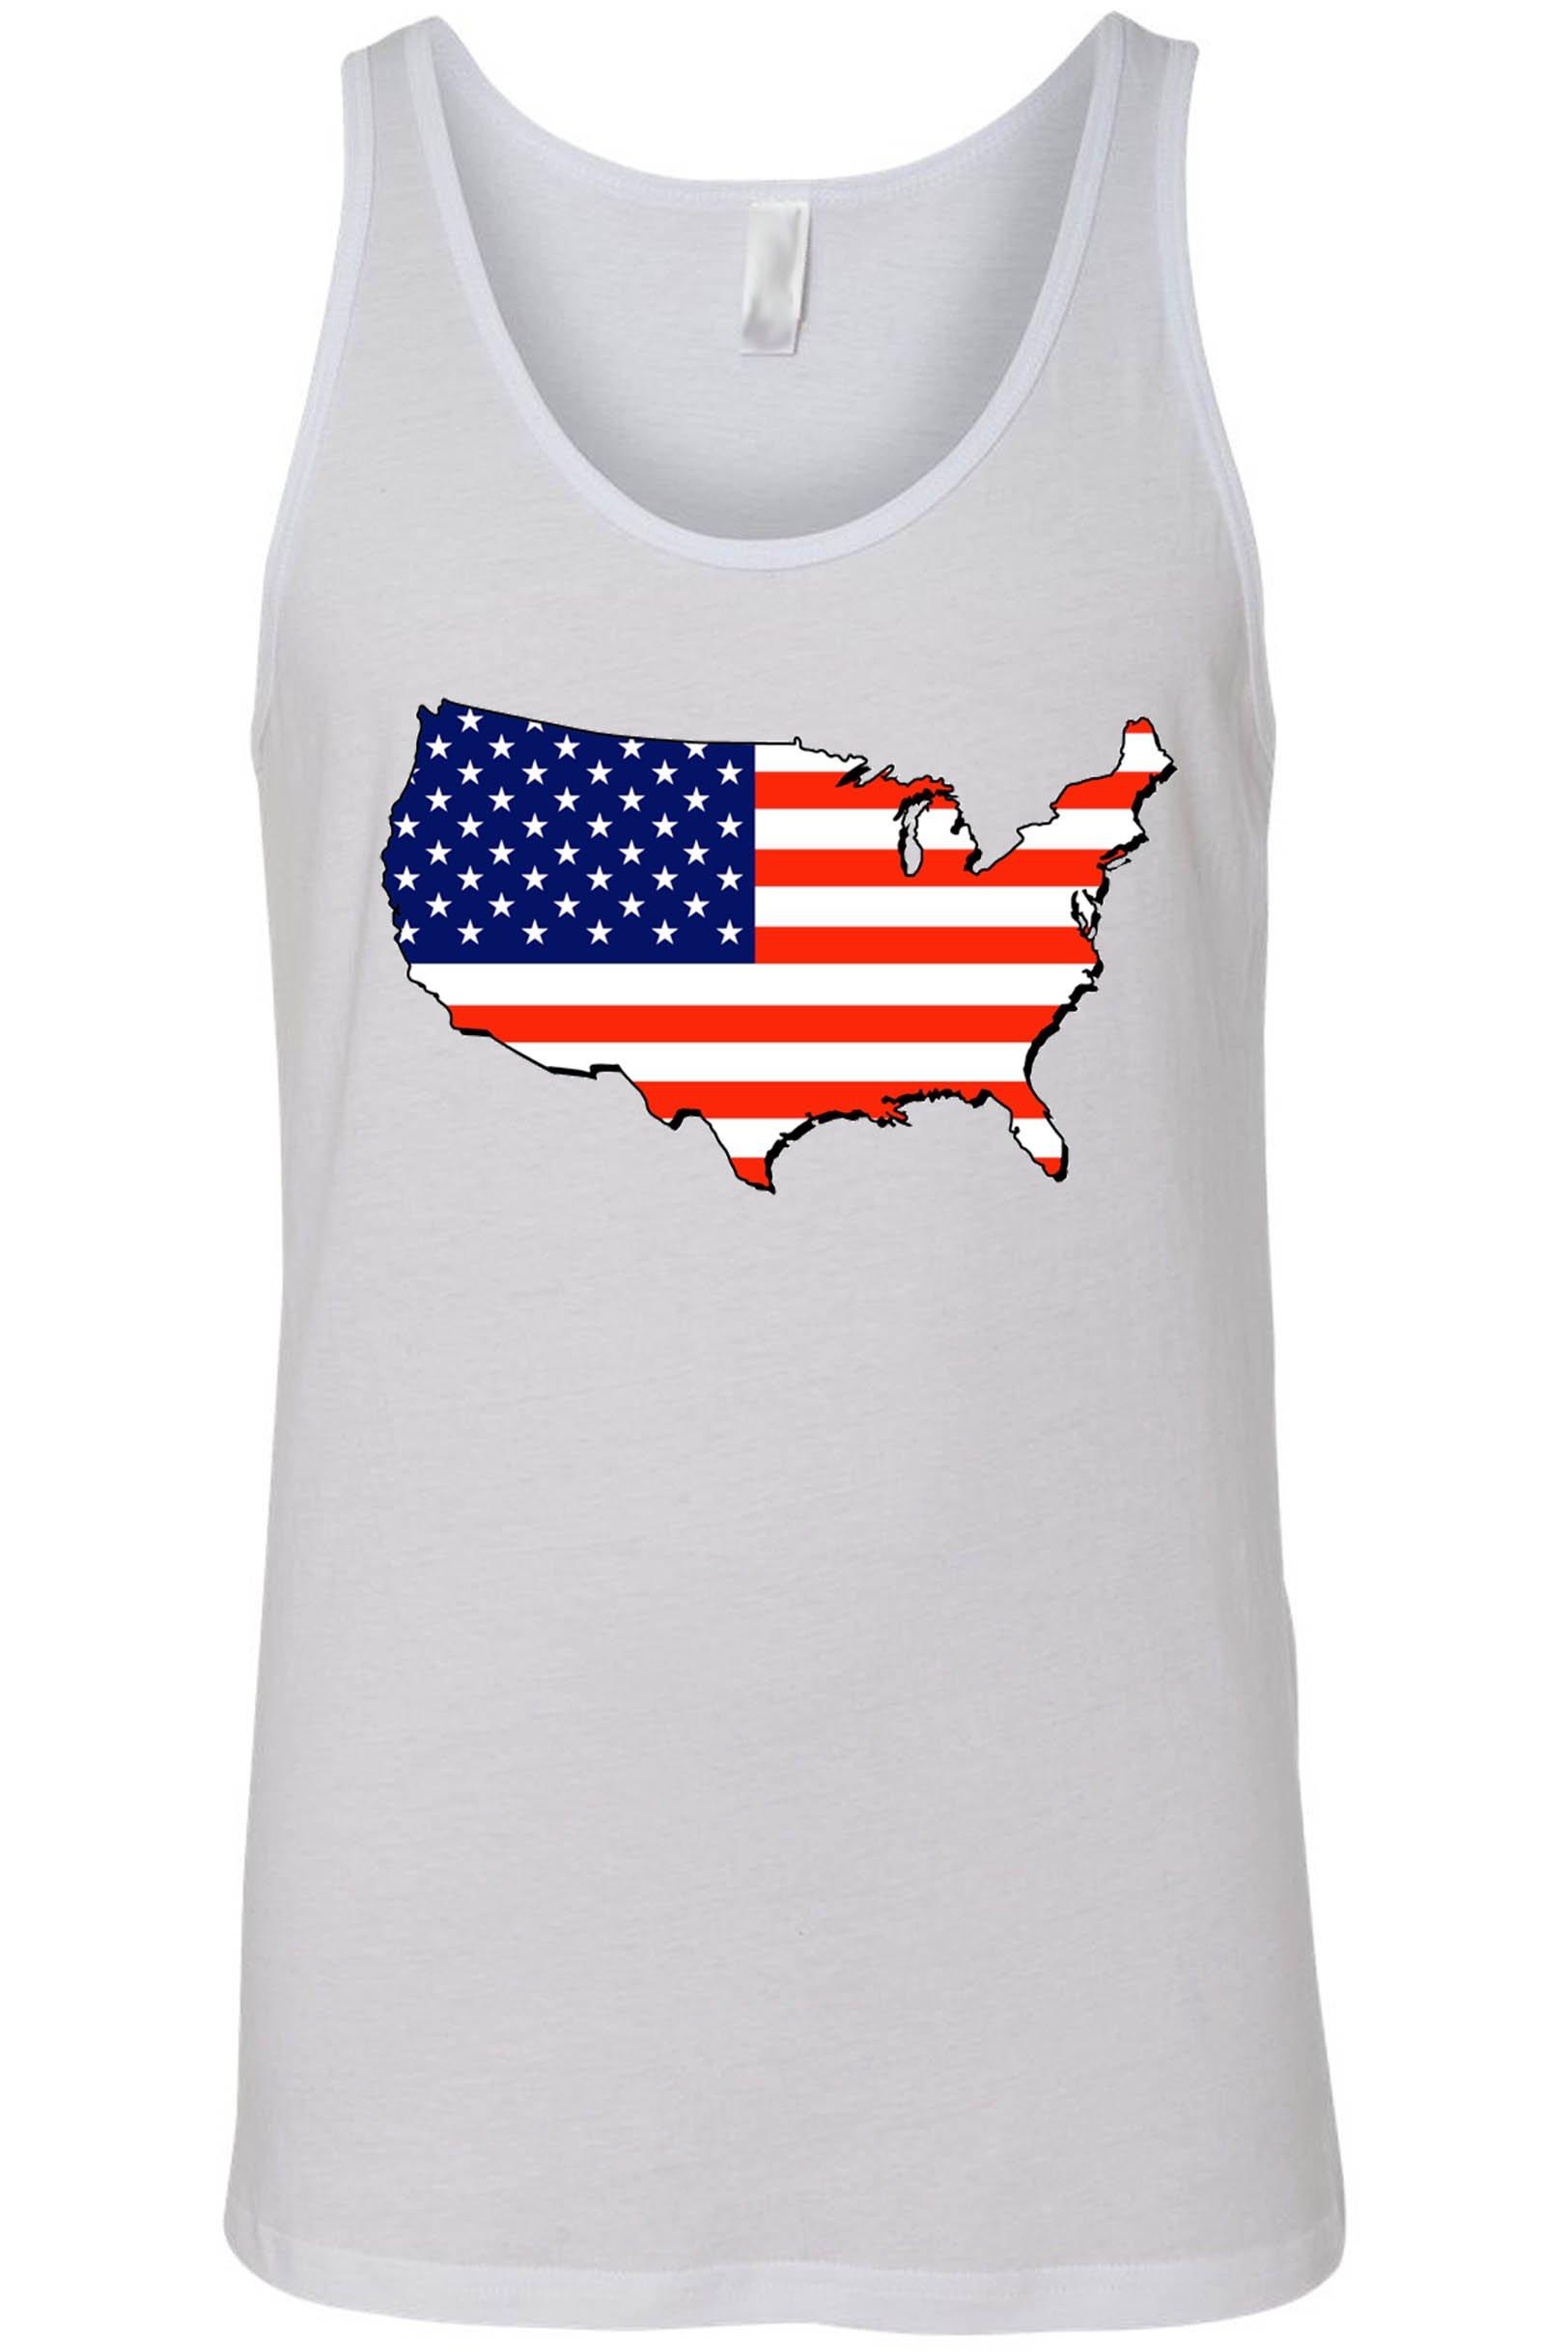 d61624e74d4 USA Flag Tank Top Men s Love For Your Country WHITE - SHORETRENDZ Drapeau  Usa